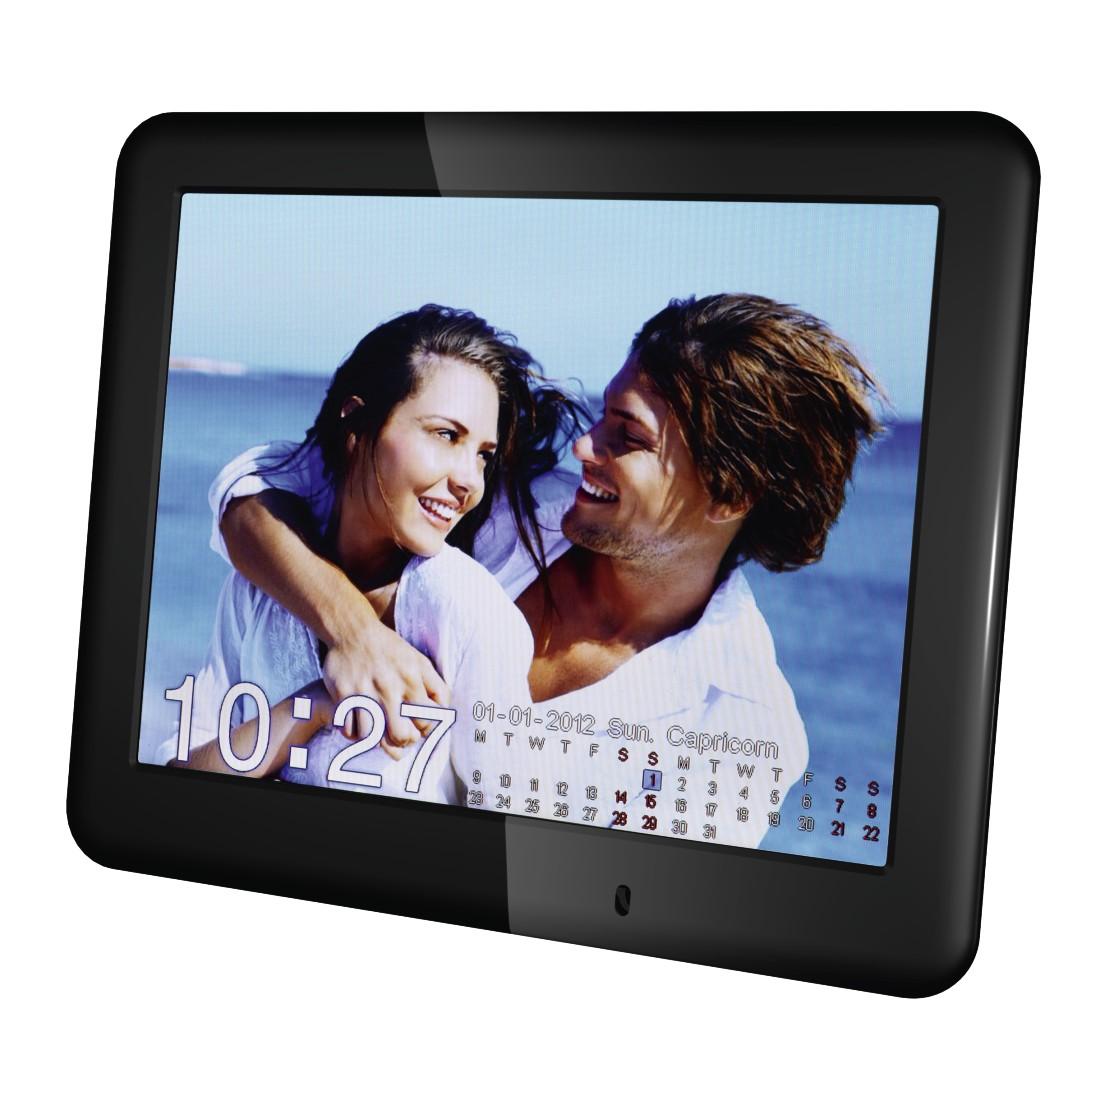 00095264 Hama 8uslb Digital Photo Frame 2032 Cm 80 Ultra